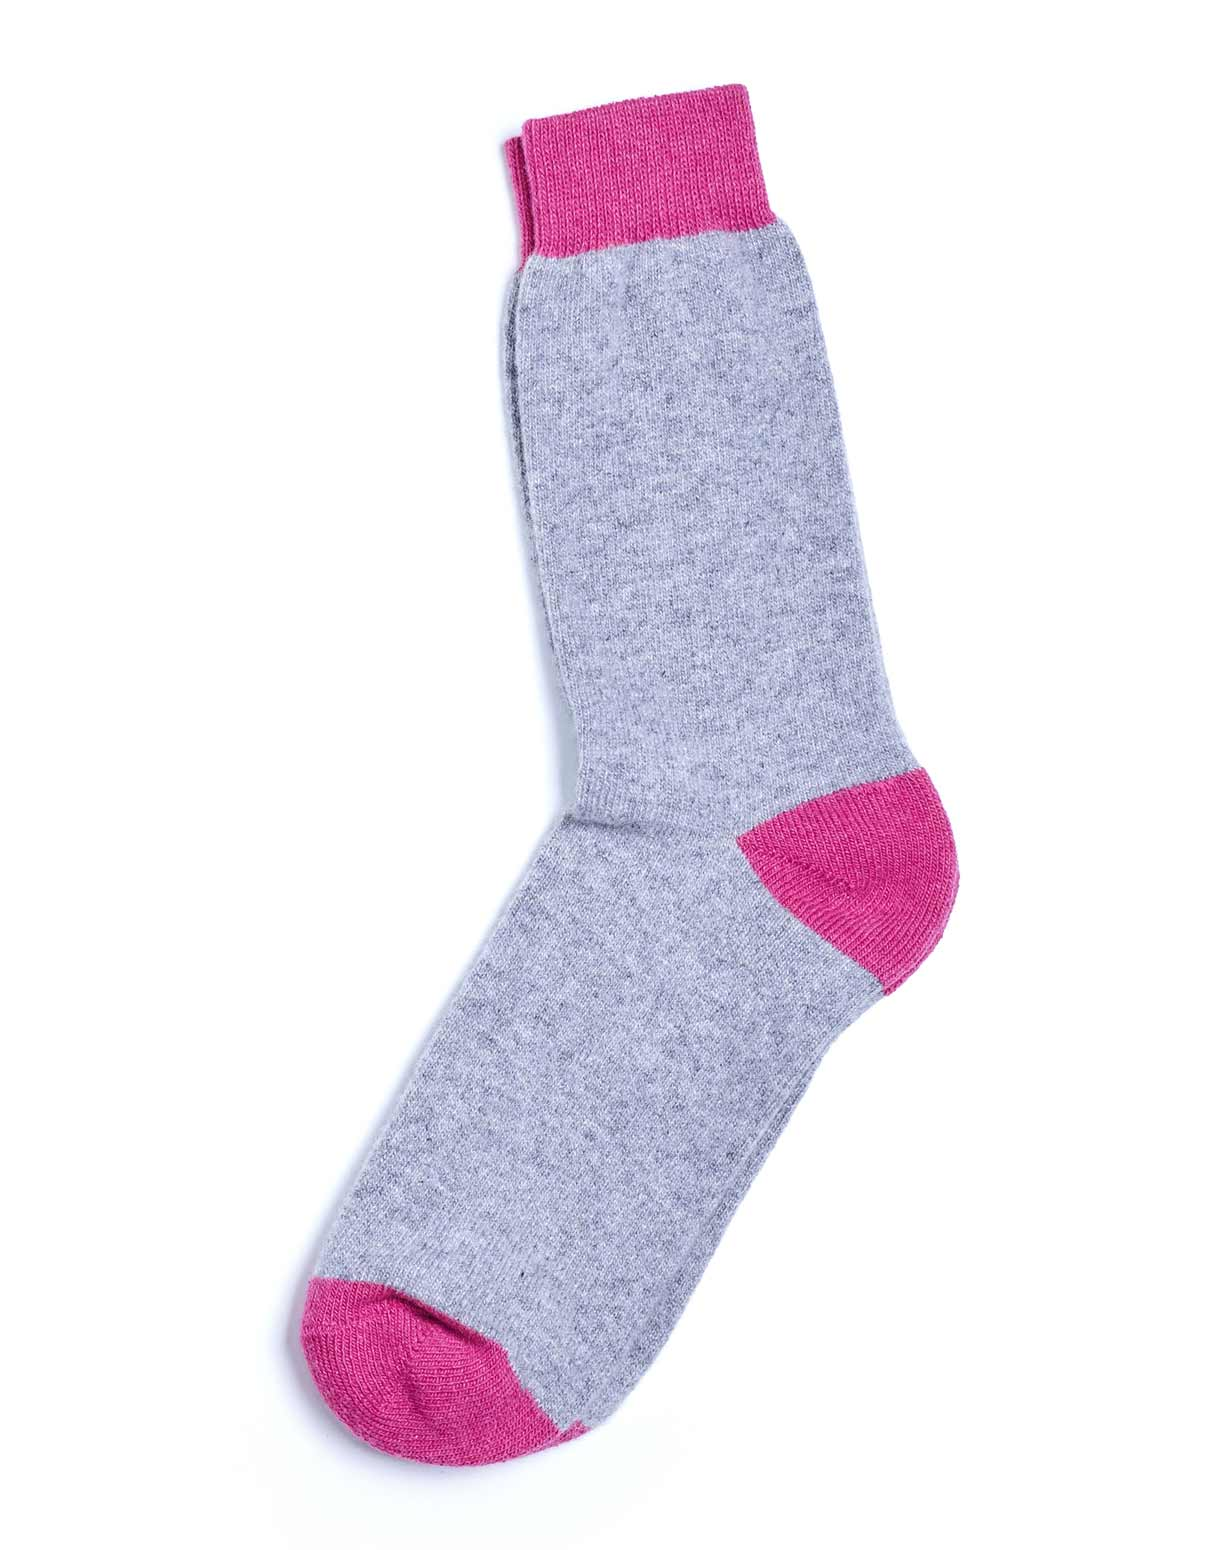 Unisex Cashmere Chunky Socks - Grey